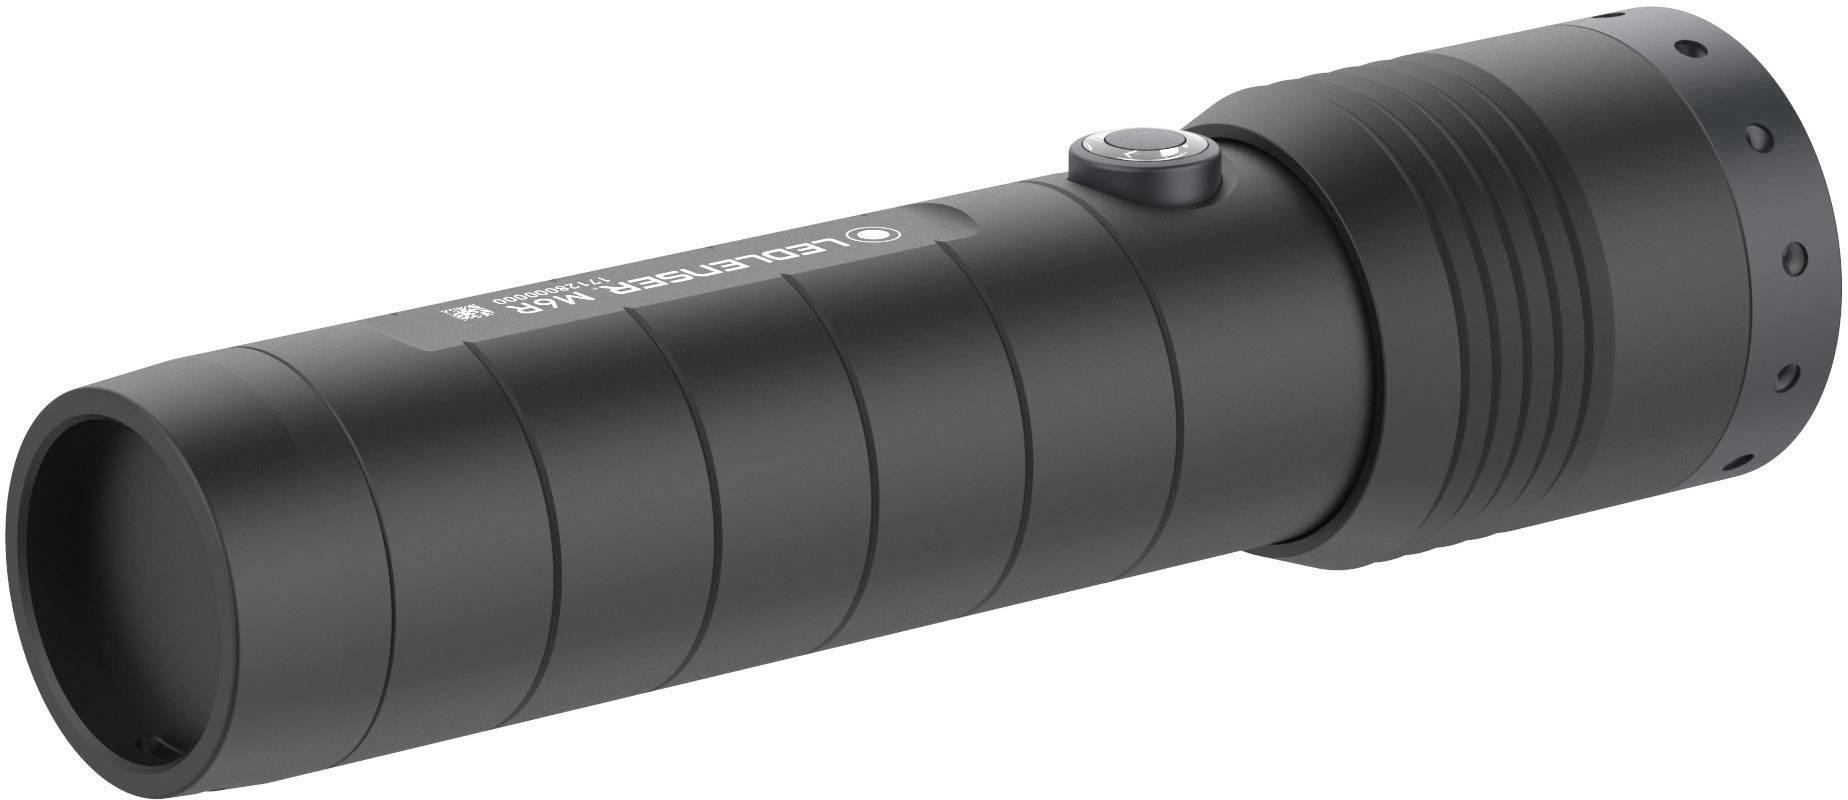 LED Lenser 501034/Adapter/ /Light Mounts /& Accessories Adapter, Black P7QC, P7.2/LED Lenser MT10, MT14, B7.2////p7r////T7.2//T7/M